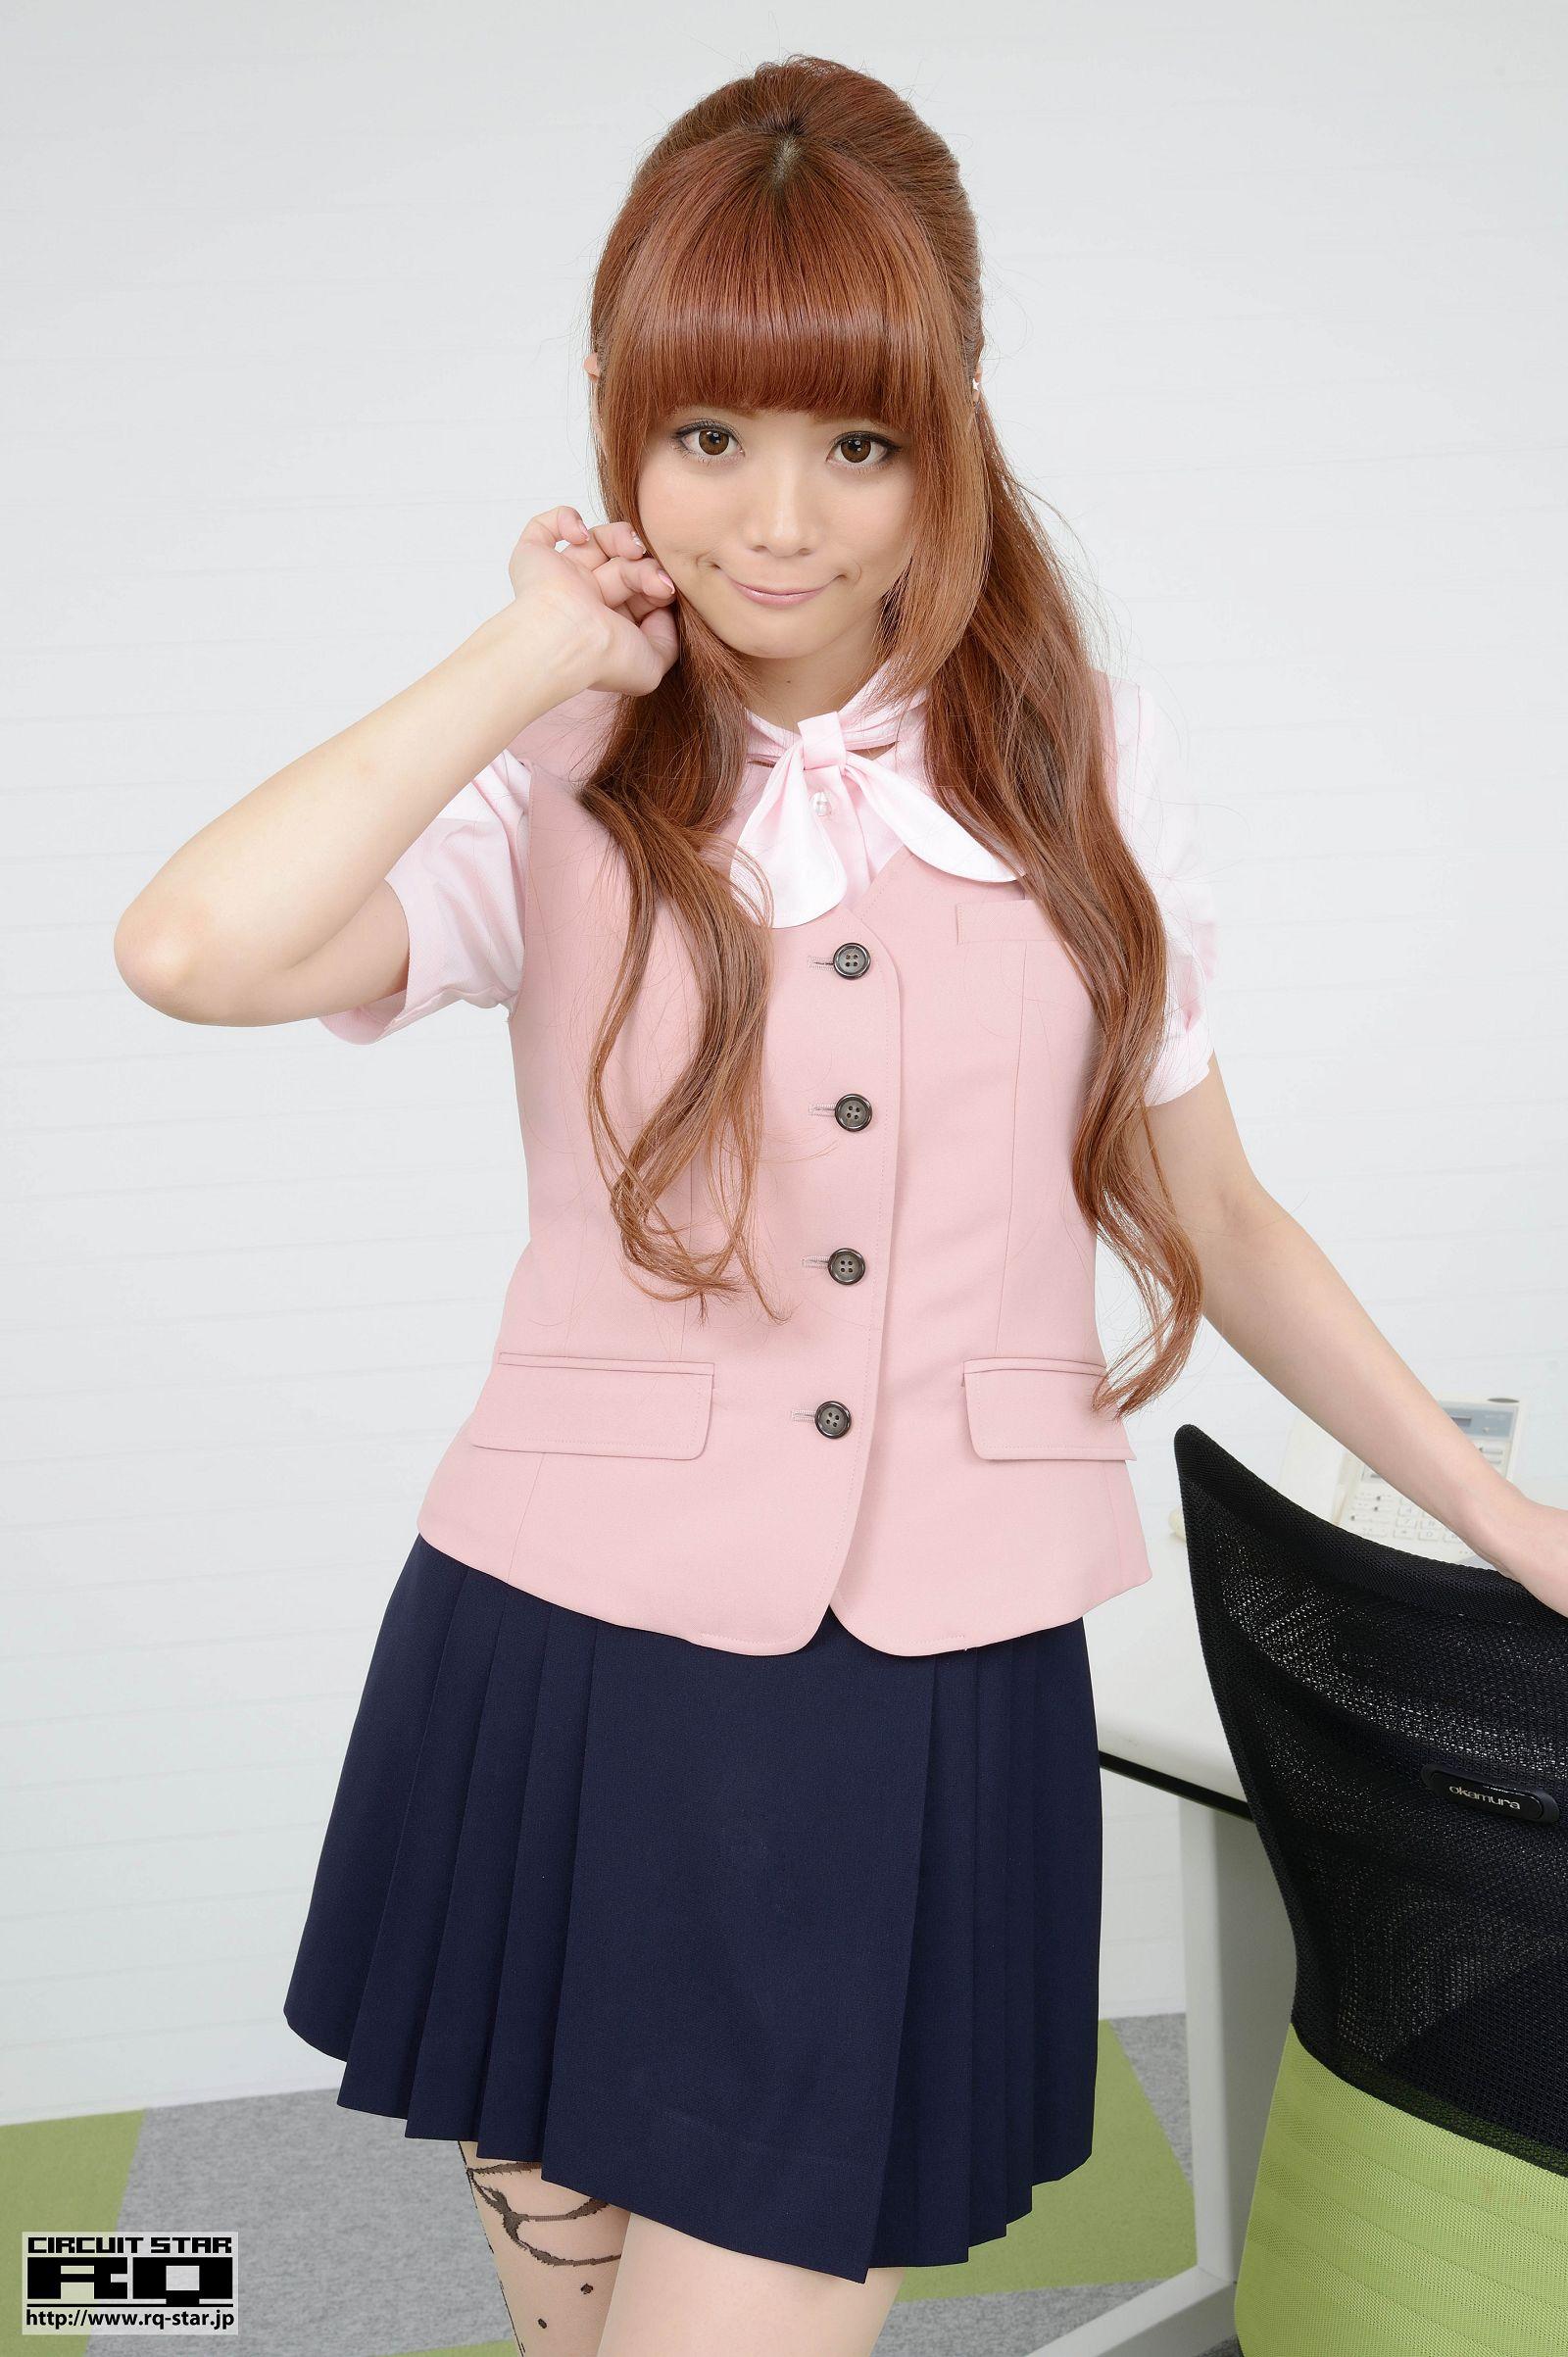 [RQ STAR美女] NO.00832 Aine Sayuka 朔矢あいね Office Lady[120P] RQ STAR 第2张